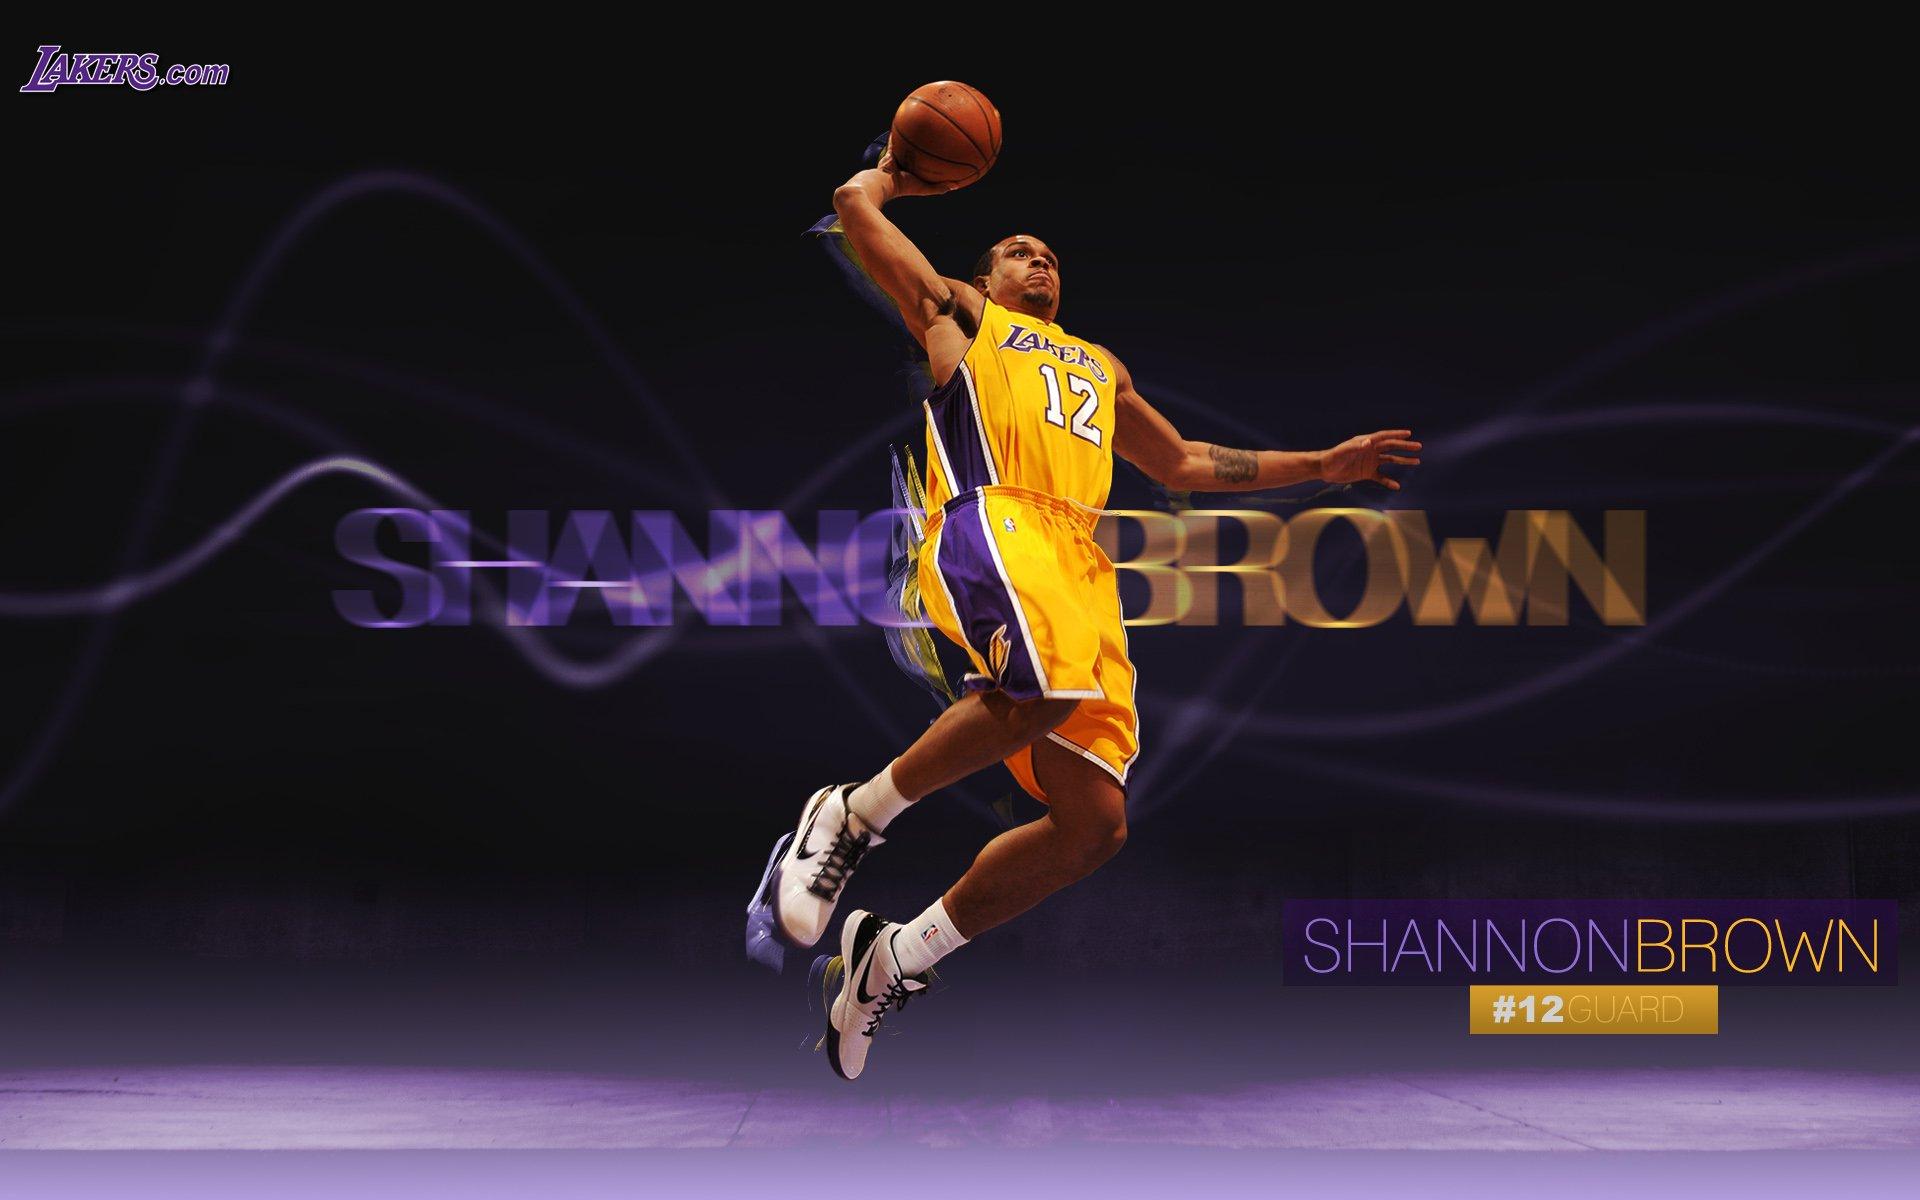 Los Angeles Lakers Wallpaper Hd Lakers Wallpaper Brown Hd Desktop Wallpapers 4k Hd